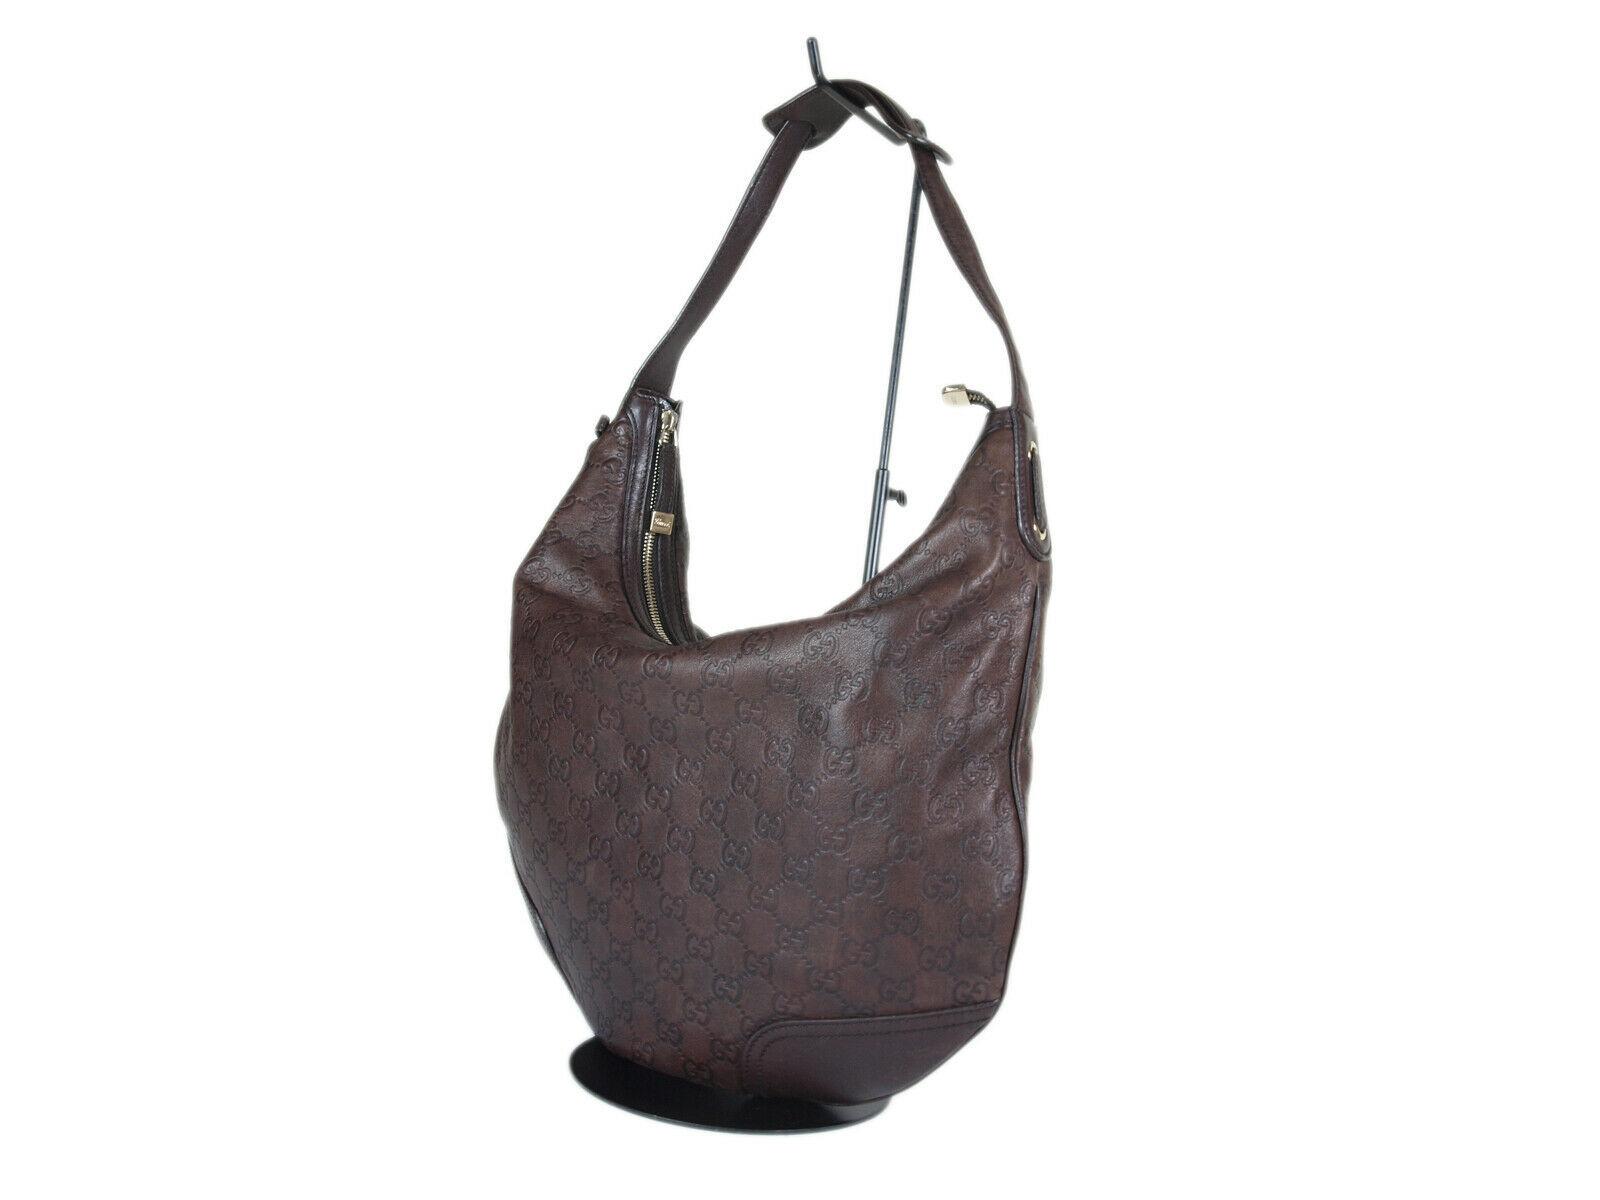 Auth GUCCI Guccissima Leather Dark Brown Shoulder Bag GH2155